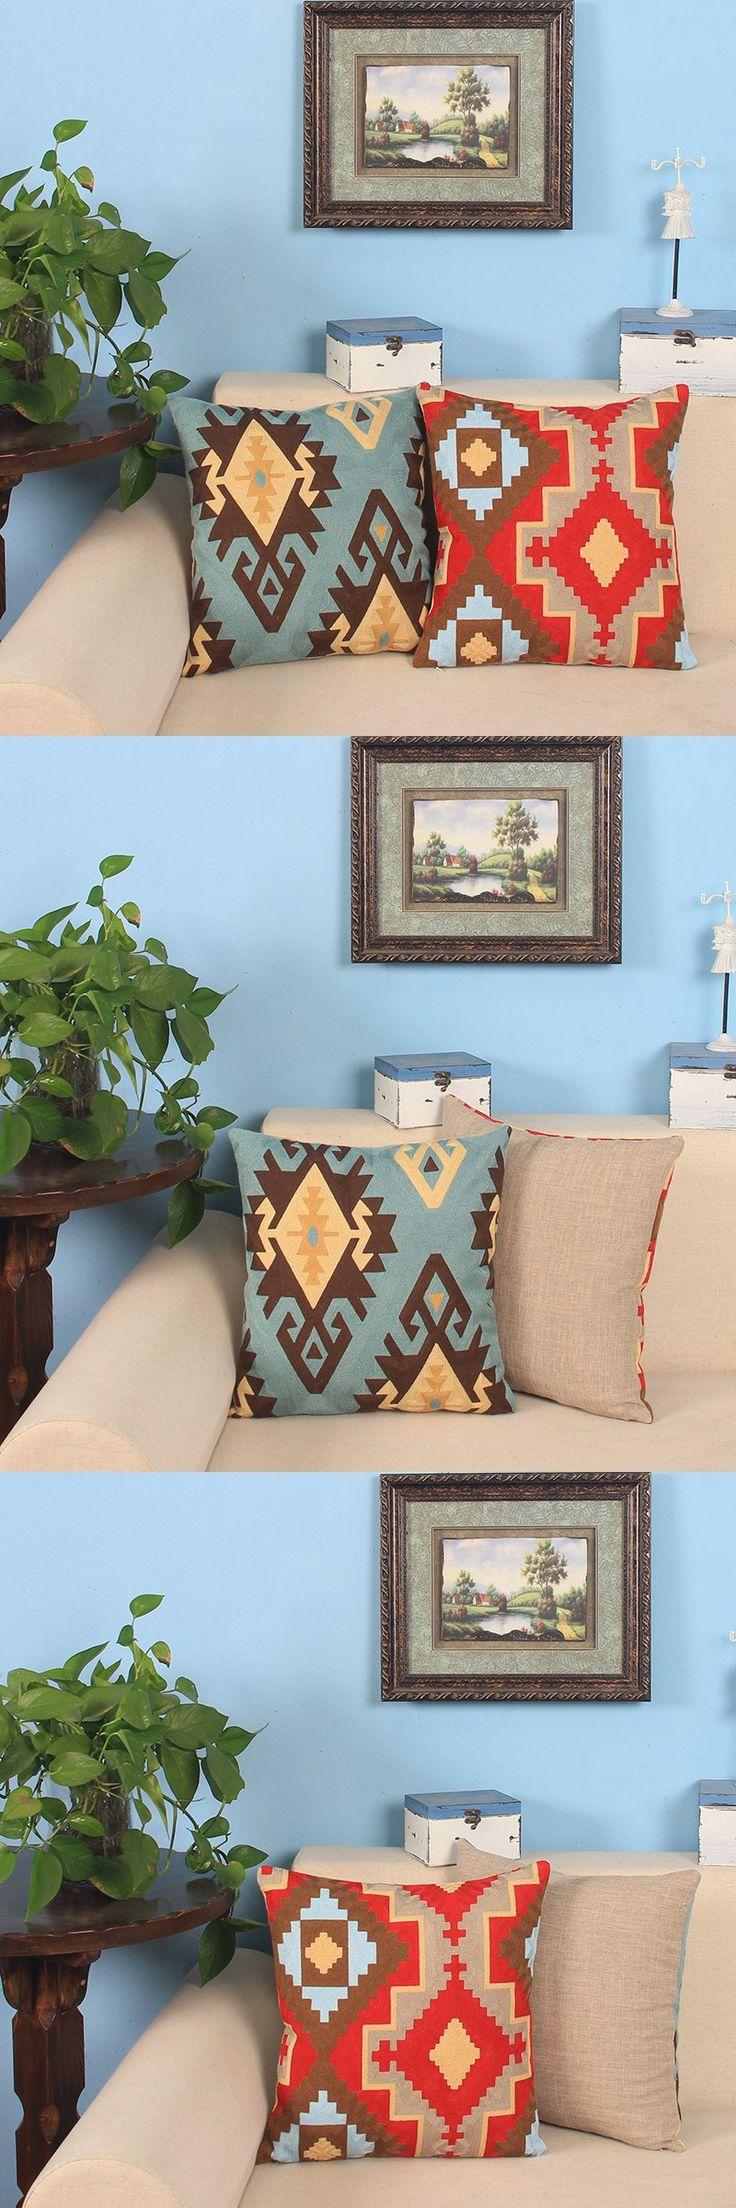 Cotton/Linen Embroidery Throw Cushions Cover Sofa Scandinavian Pillow Case Home Decorative Geometric Pillow Shell Cushion Sham $27